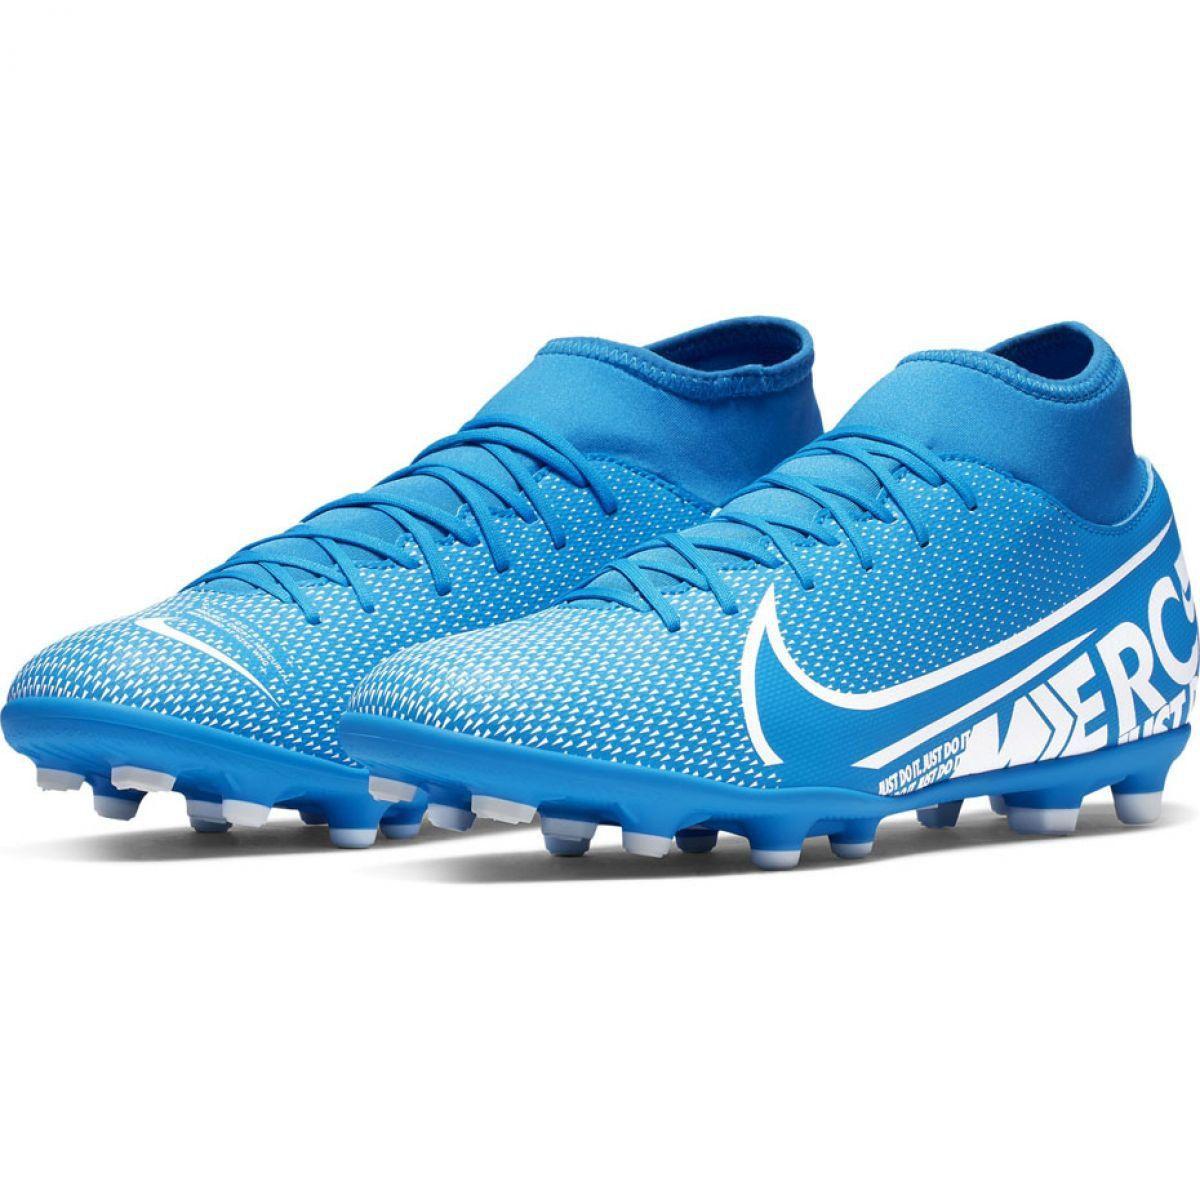 Buty Pilkarskie Nike Mercurial Superfly 7 Club Fg Mg M At7949 414 Niebieski Niebieskie Nike Buty I Buty Nike